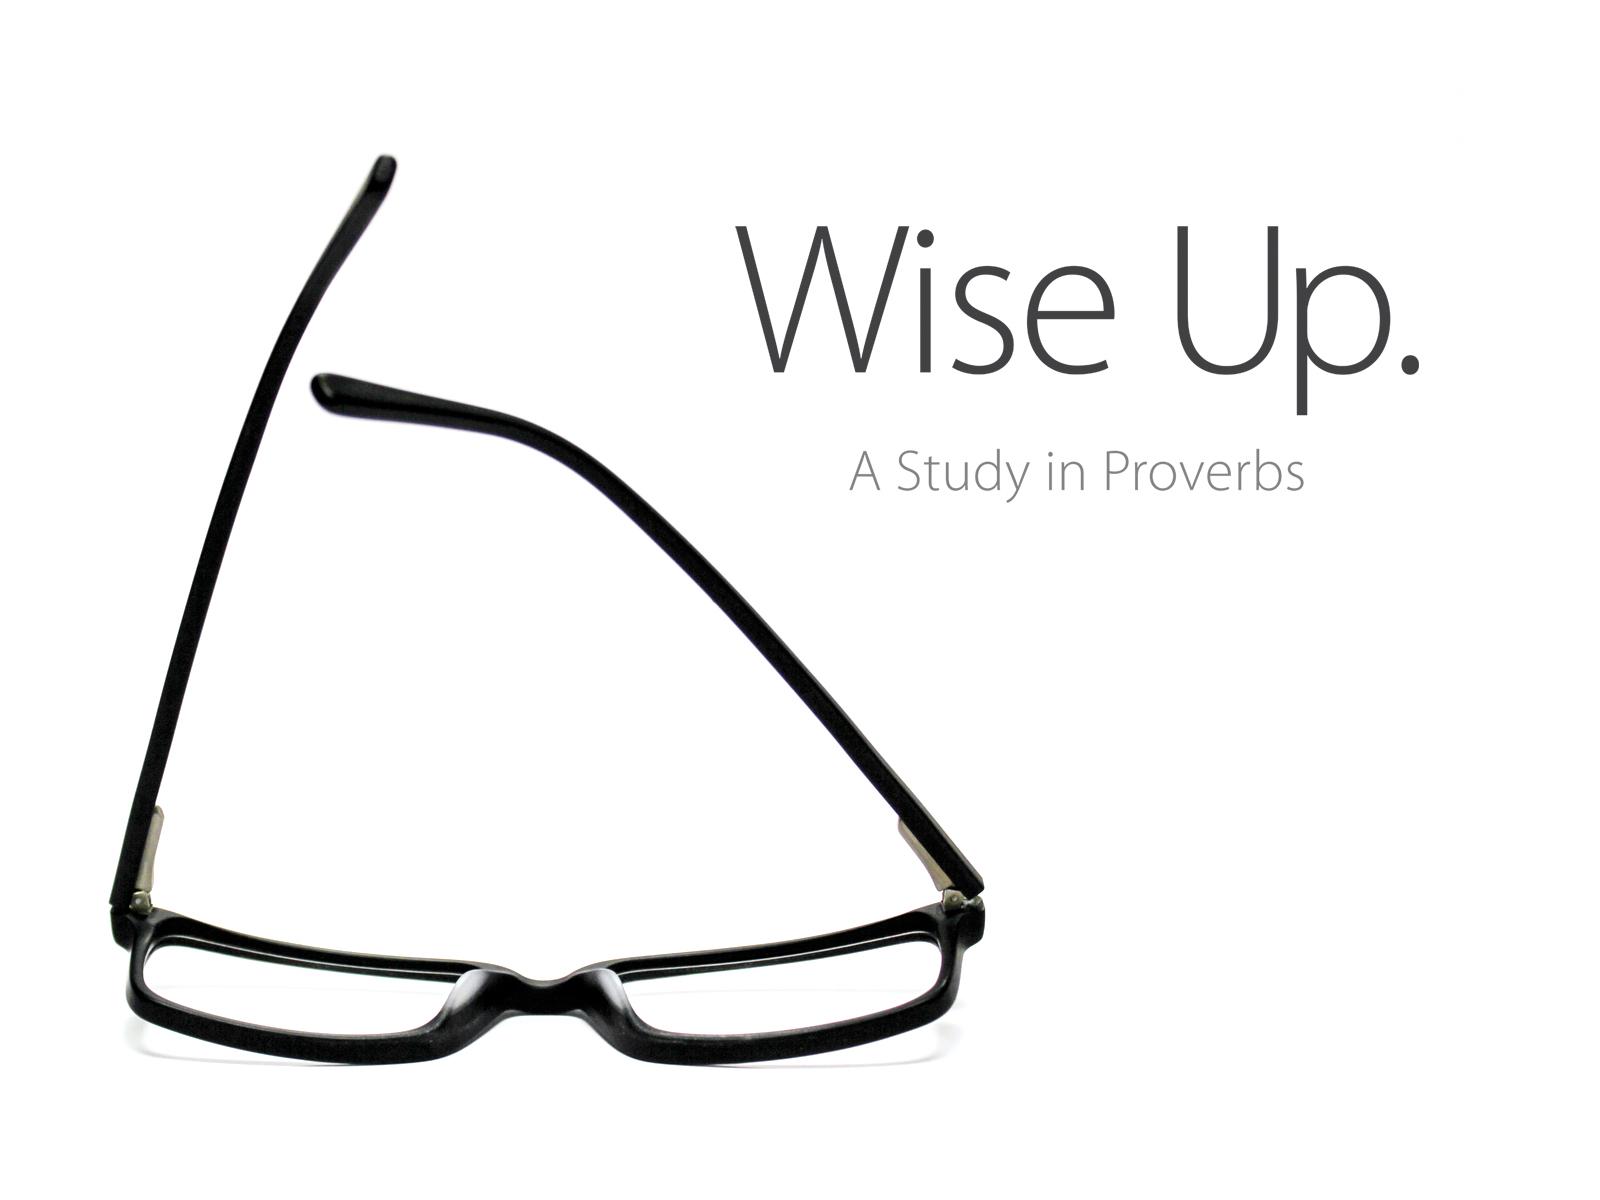 Wallpaper_Desktop_Standard_Wise_Up.jpg